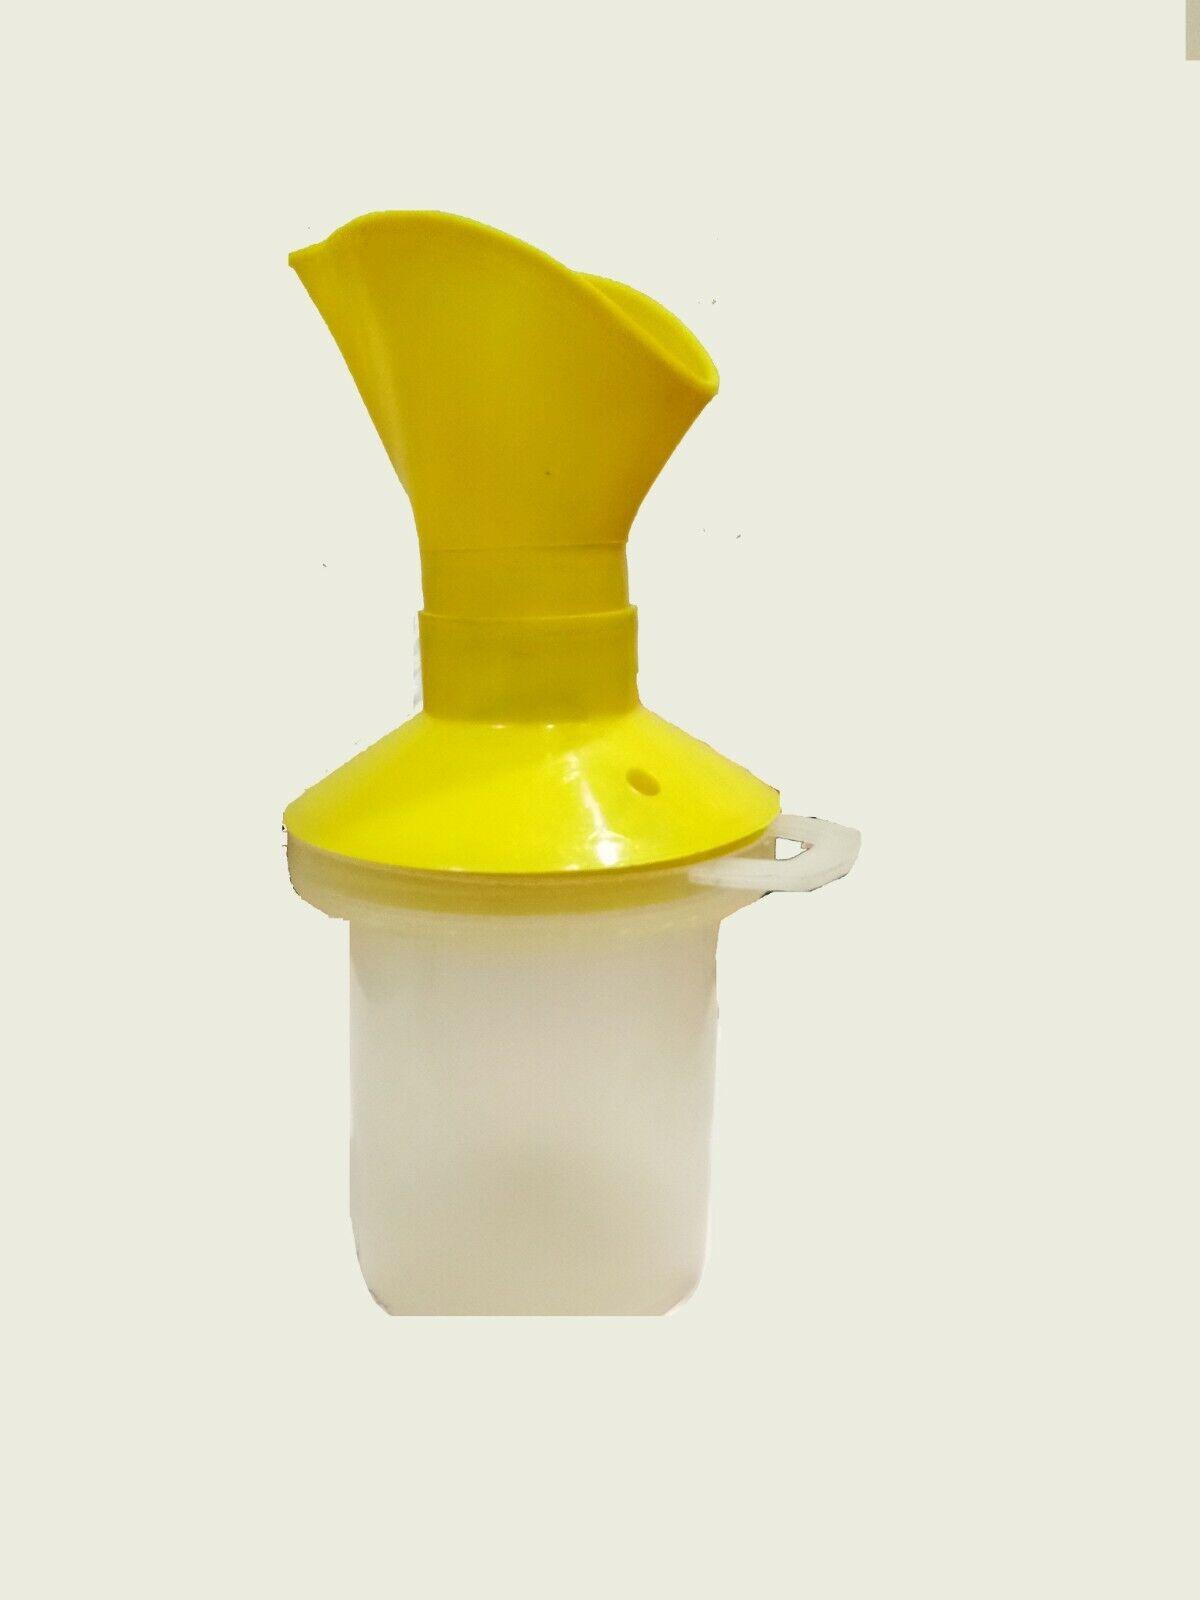 Yellow 3 In 1 Attachment Facial Sauna Steamer Nose Steamer N